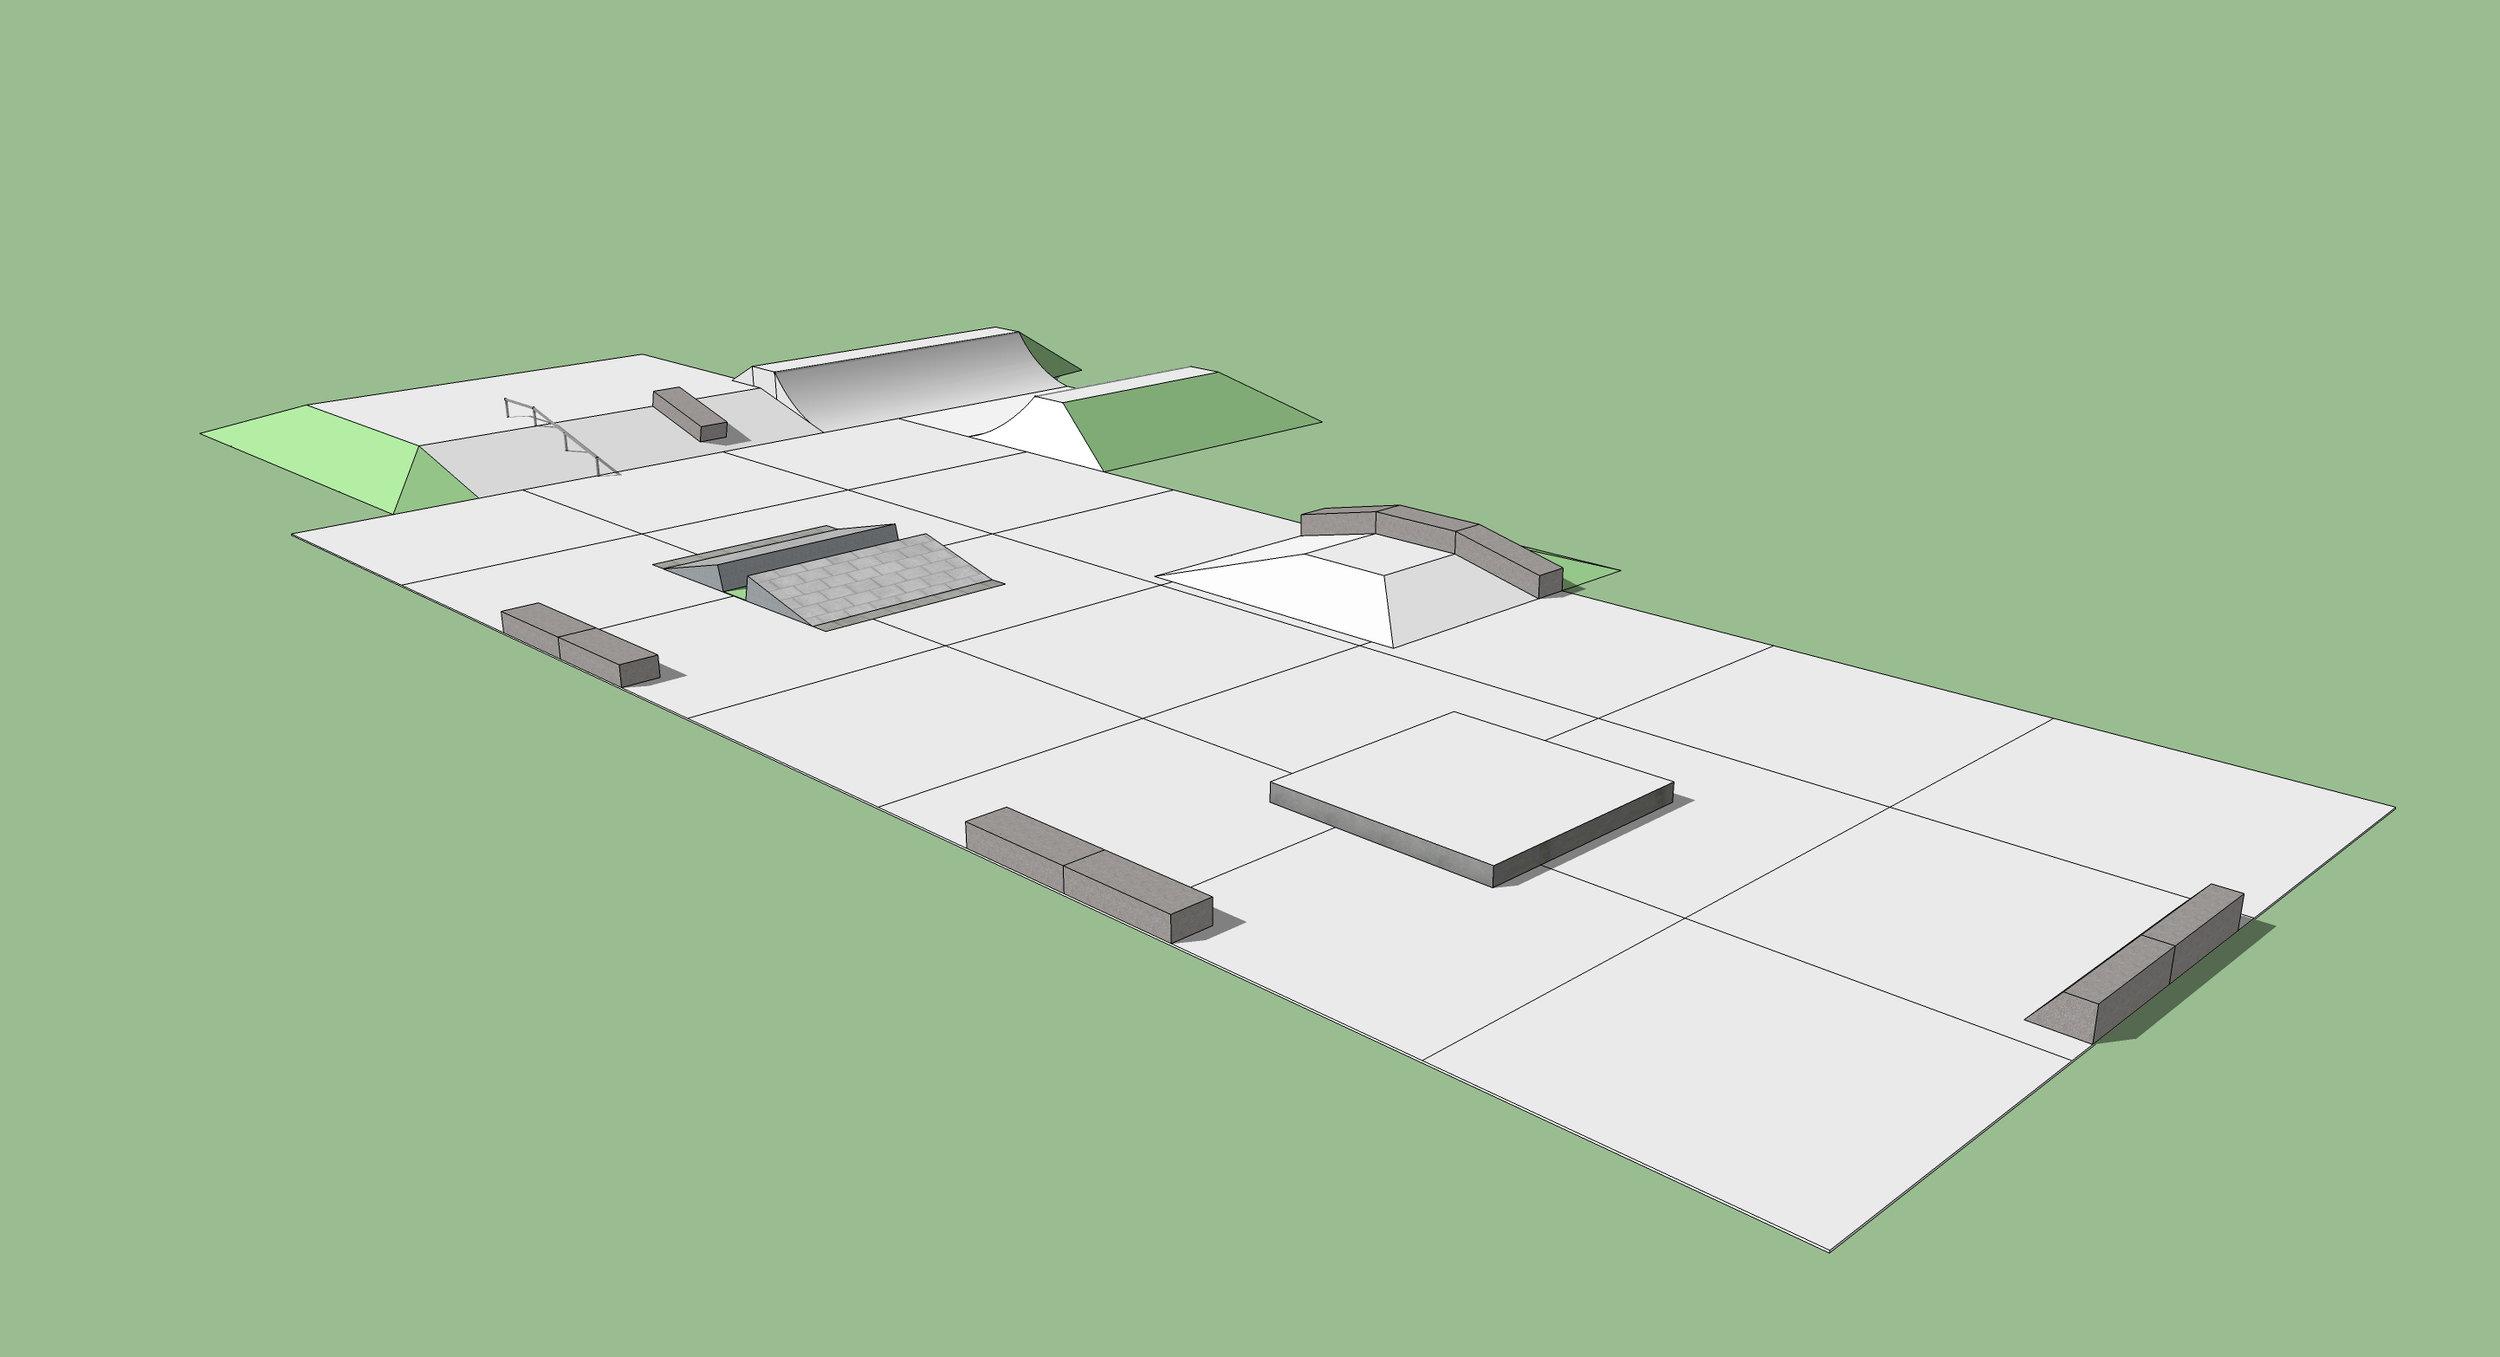 SKATE-ARCHITECTS-NAVARCLES-Skateplaza-Arquitectura-161215-notrees-24.jpg